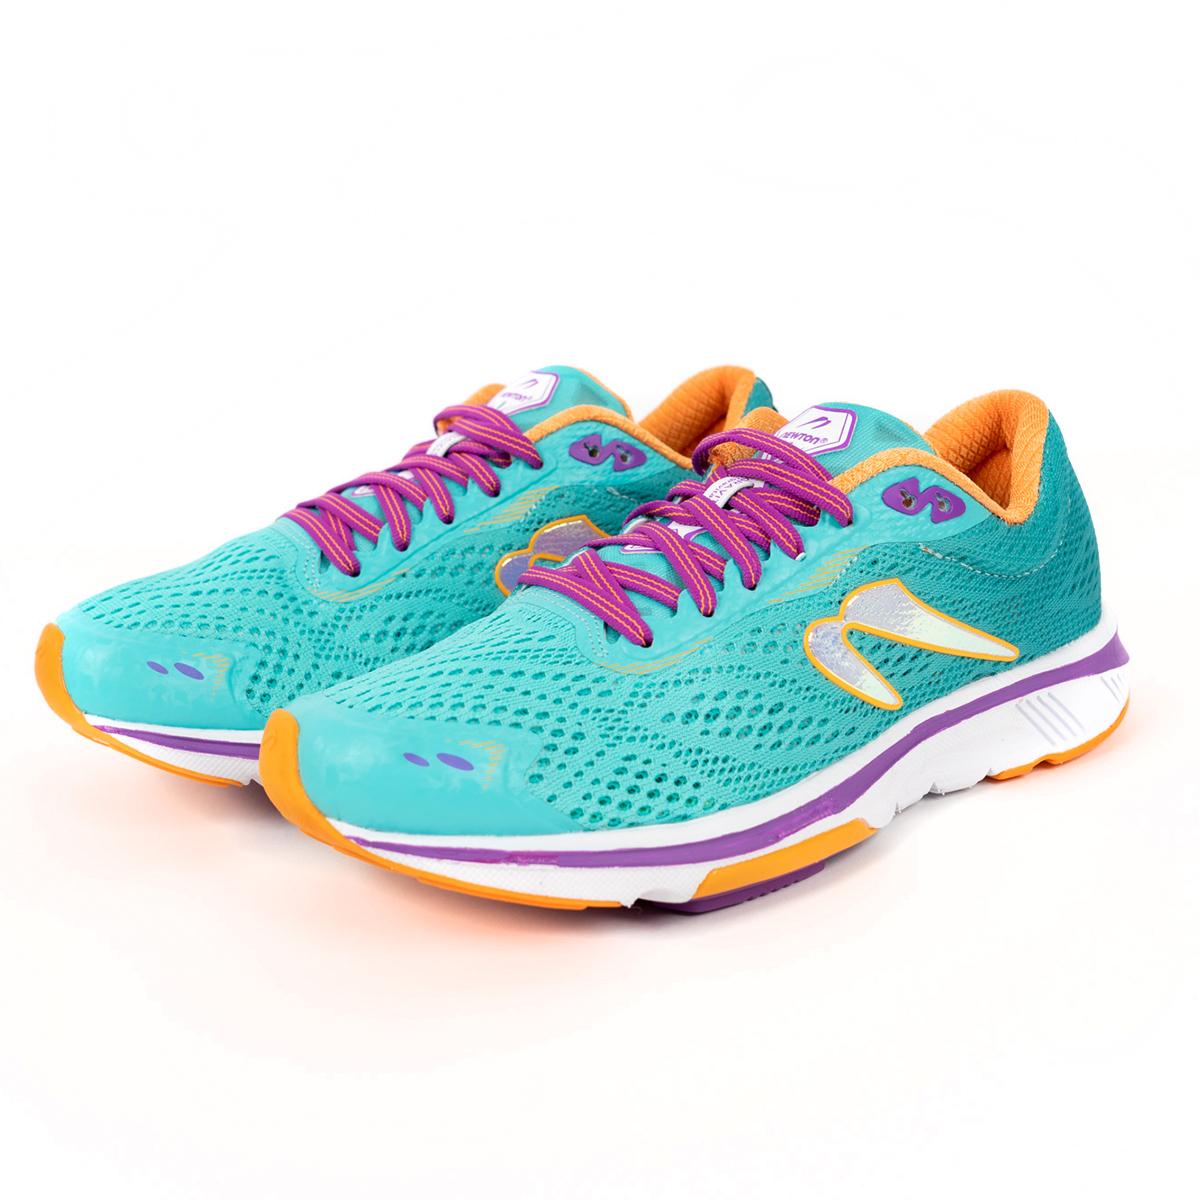 Women's Newton Gravity 9 Running Shoe - Color: Jade/Purple (Regular Width) - Size: 5, Jade/Purple, large, image 4